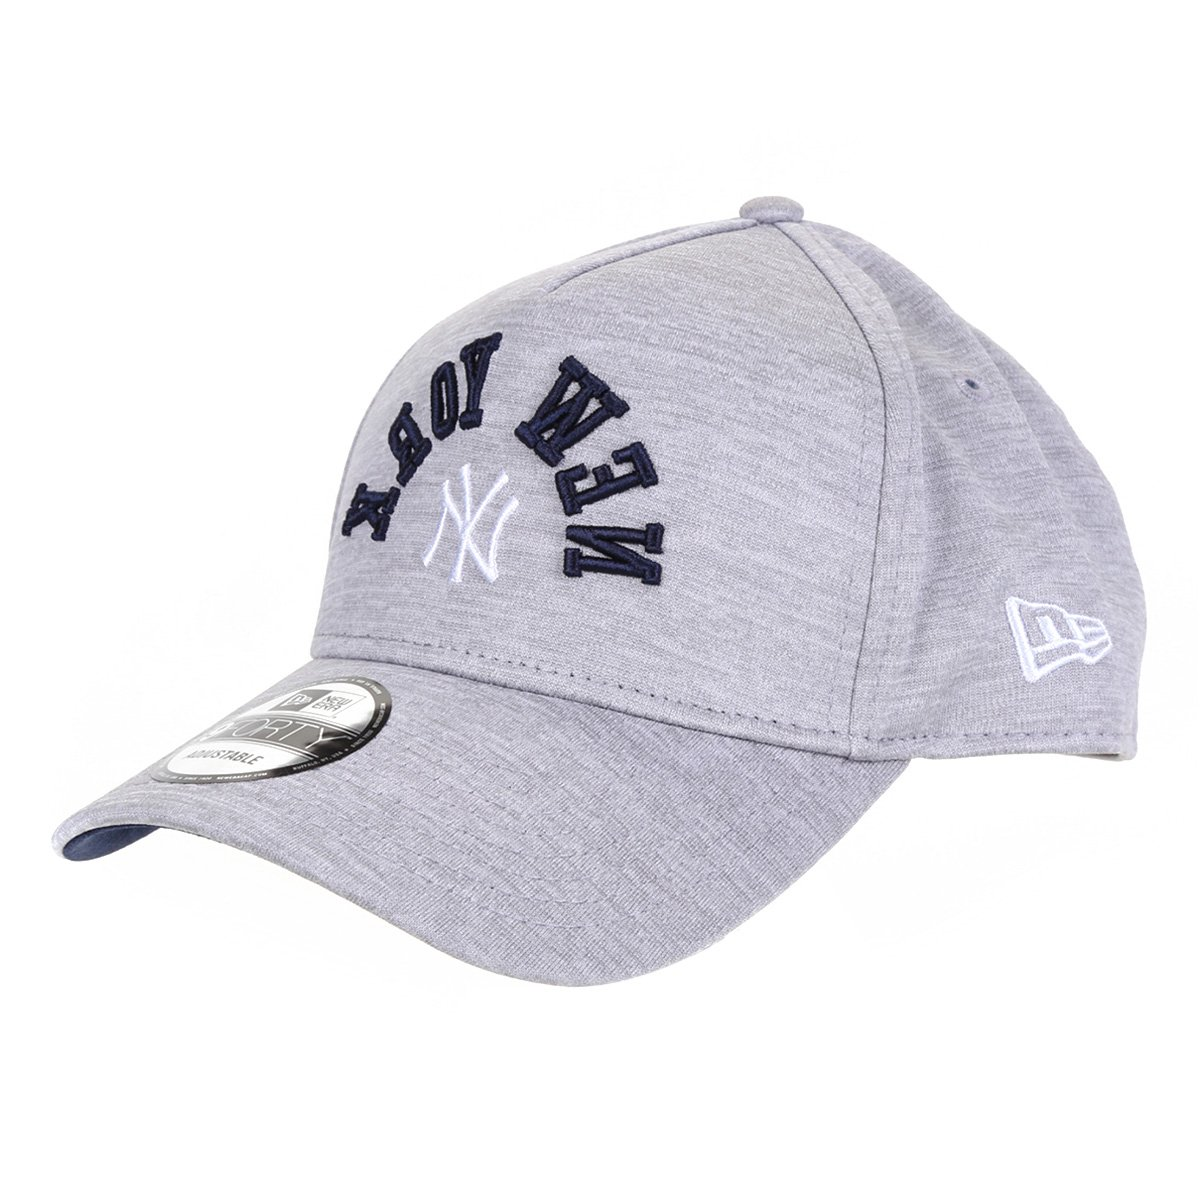 Boné New Era MLB New York Yankees Aba Curva Snapback 940 Fresh College